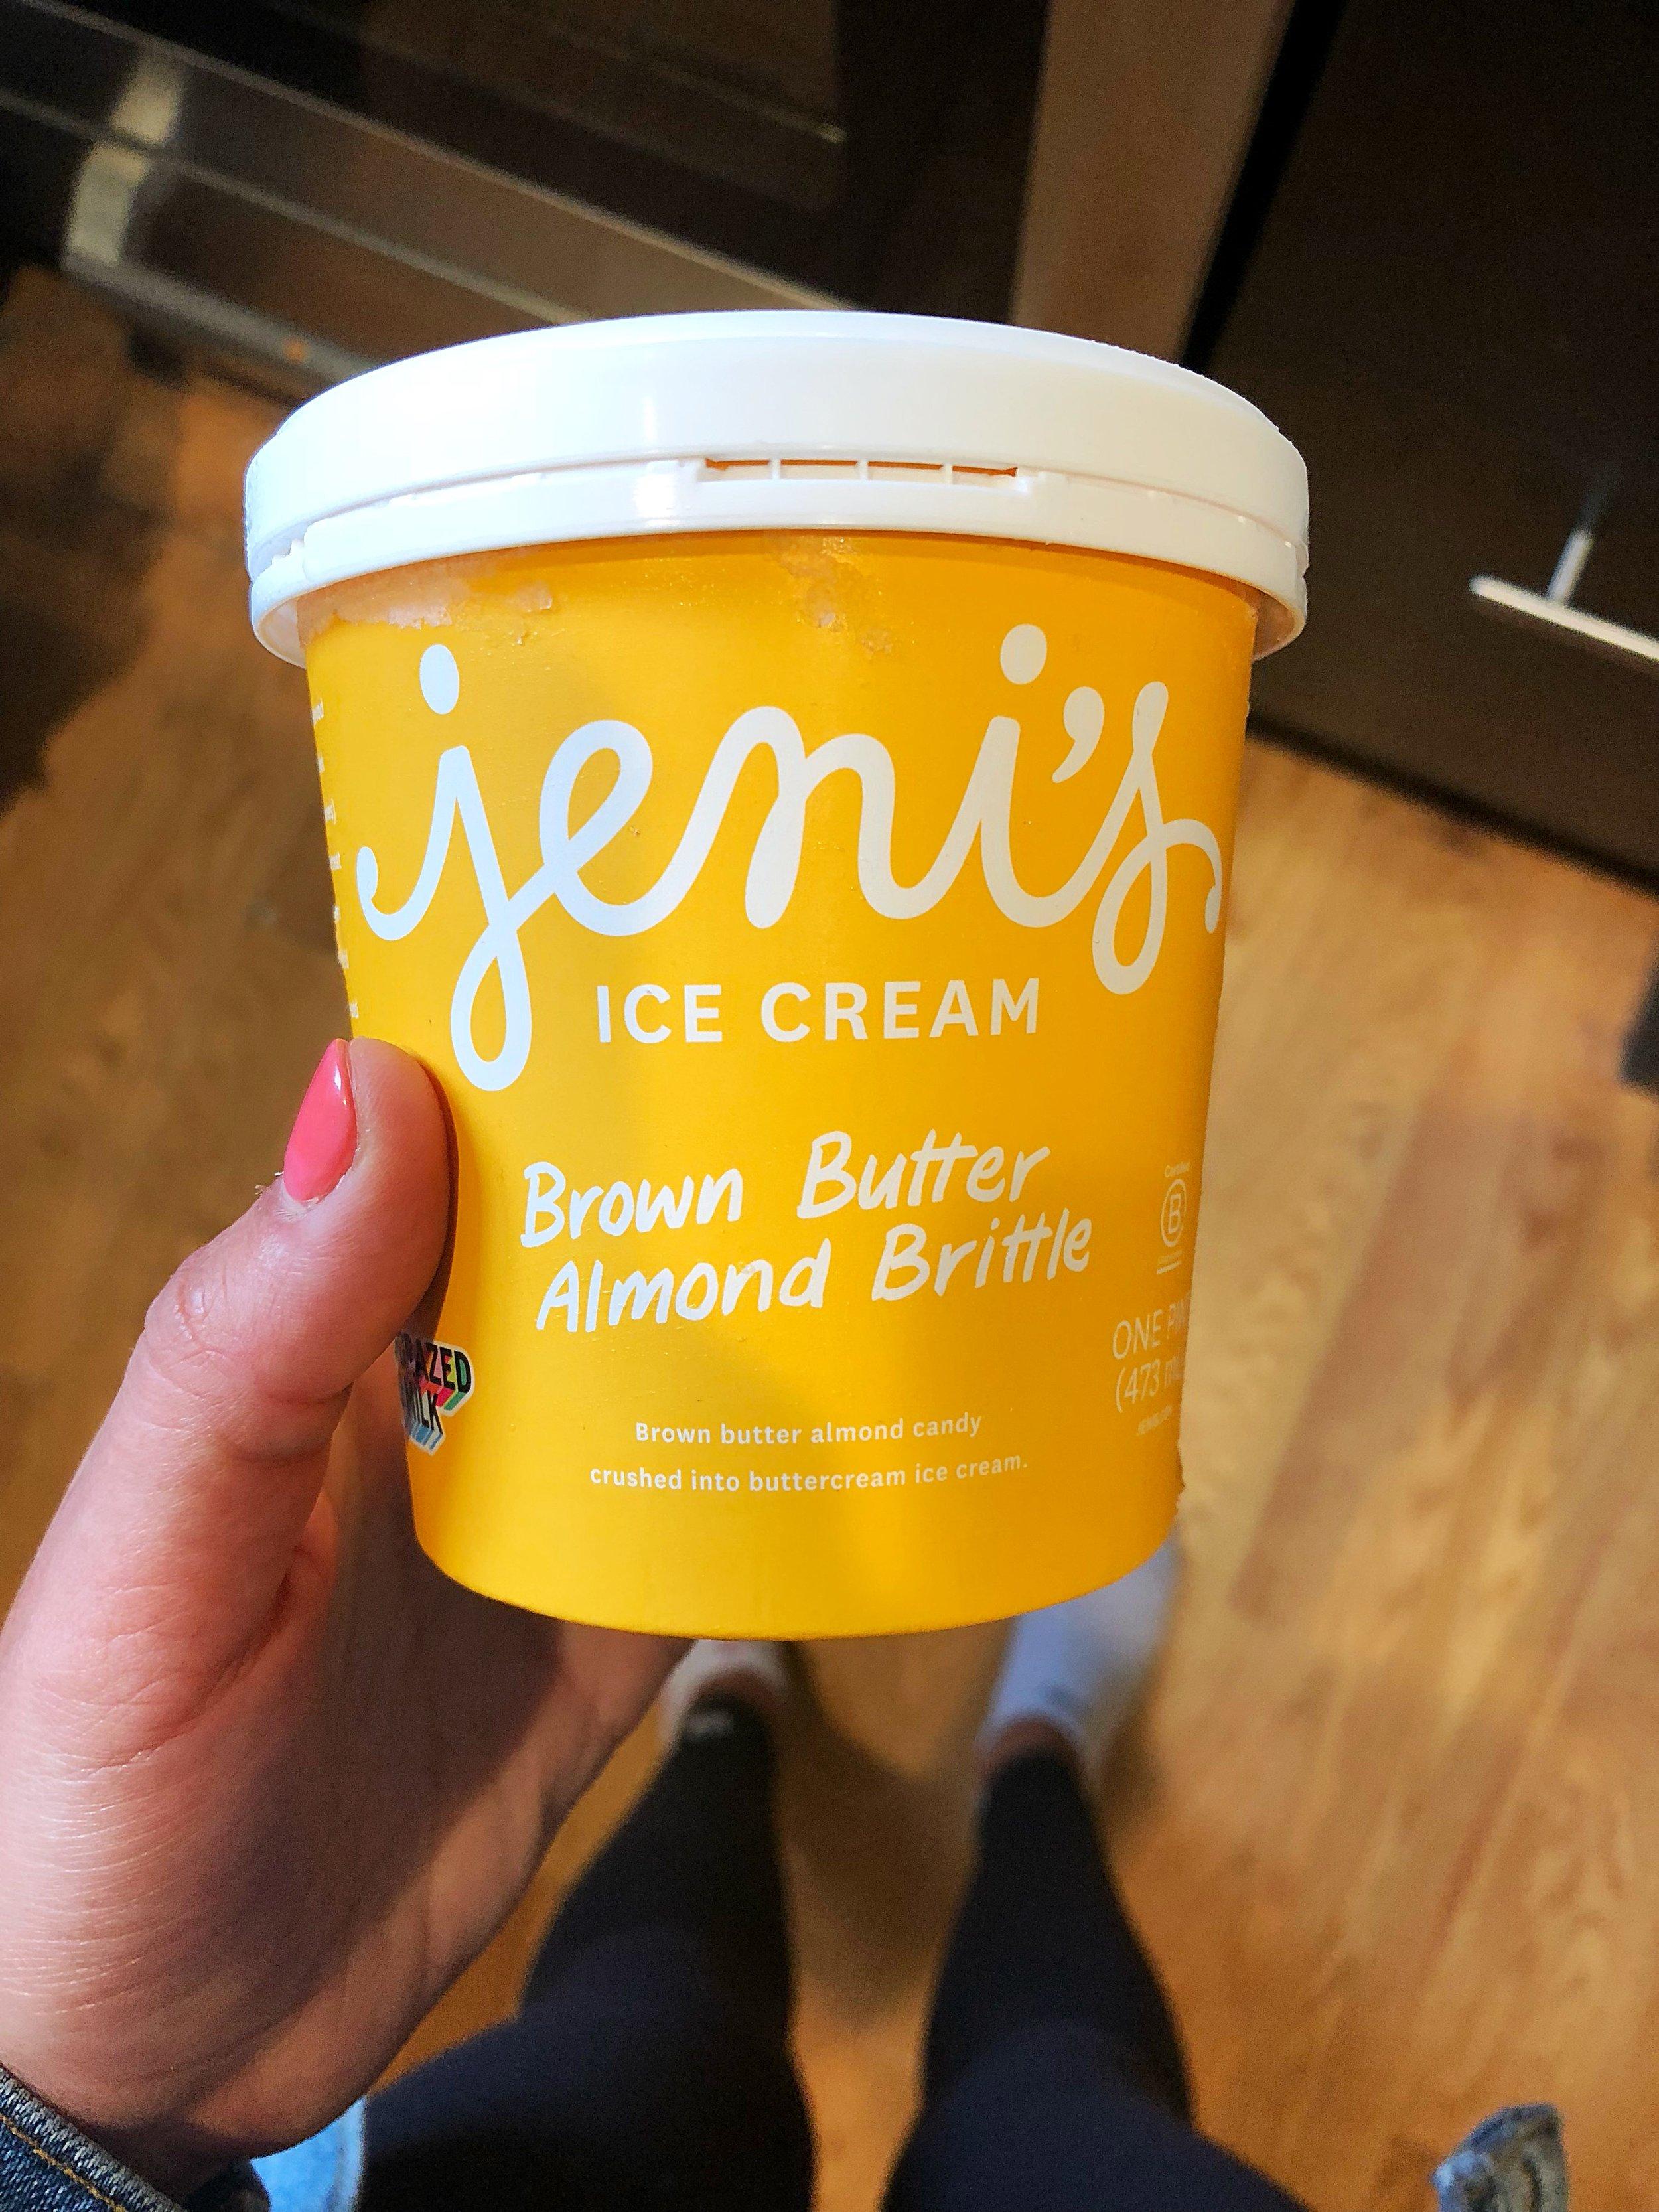 Jenis Splendid Ice Cream_Brown Butter Almond Brittle